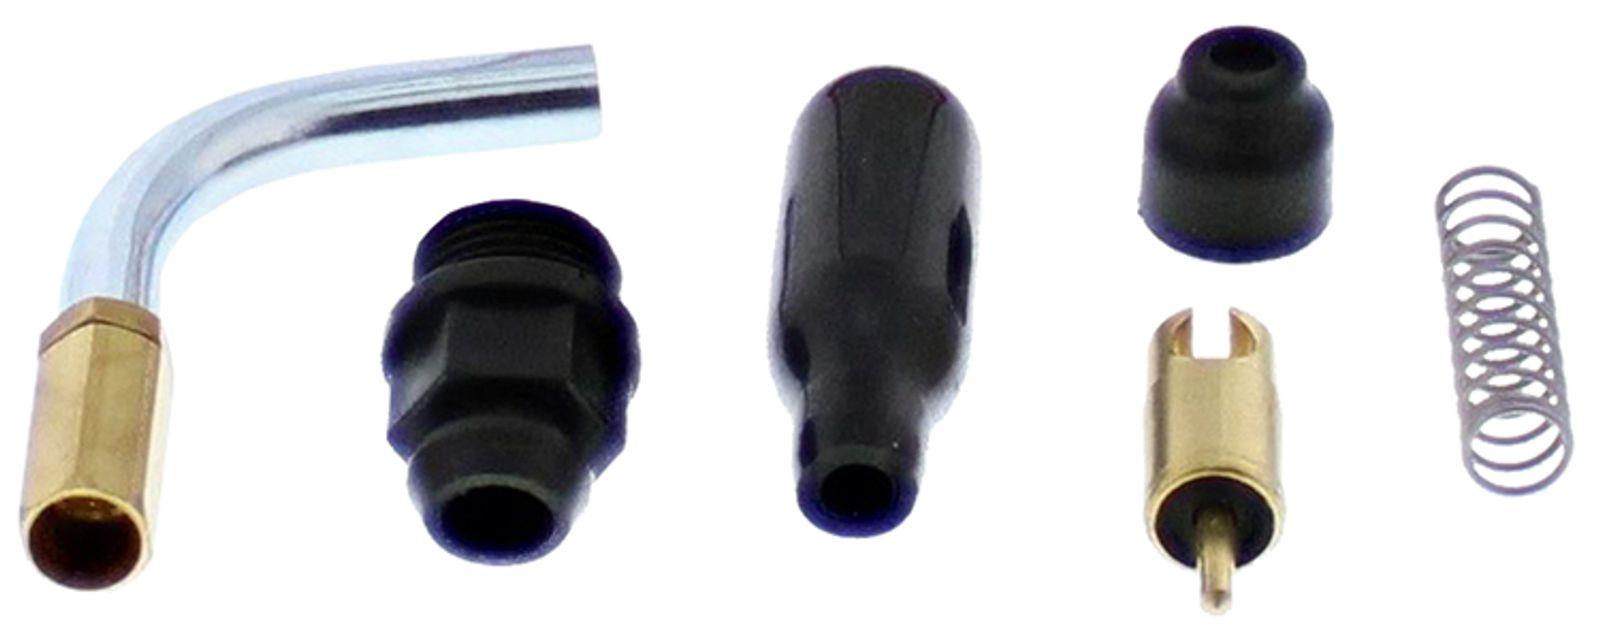 Wrp Choke Plunger Kits - WRP461011 image